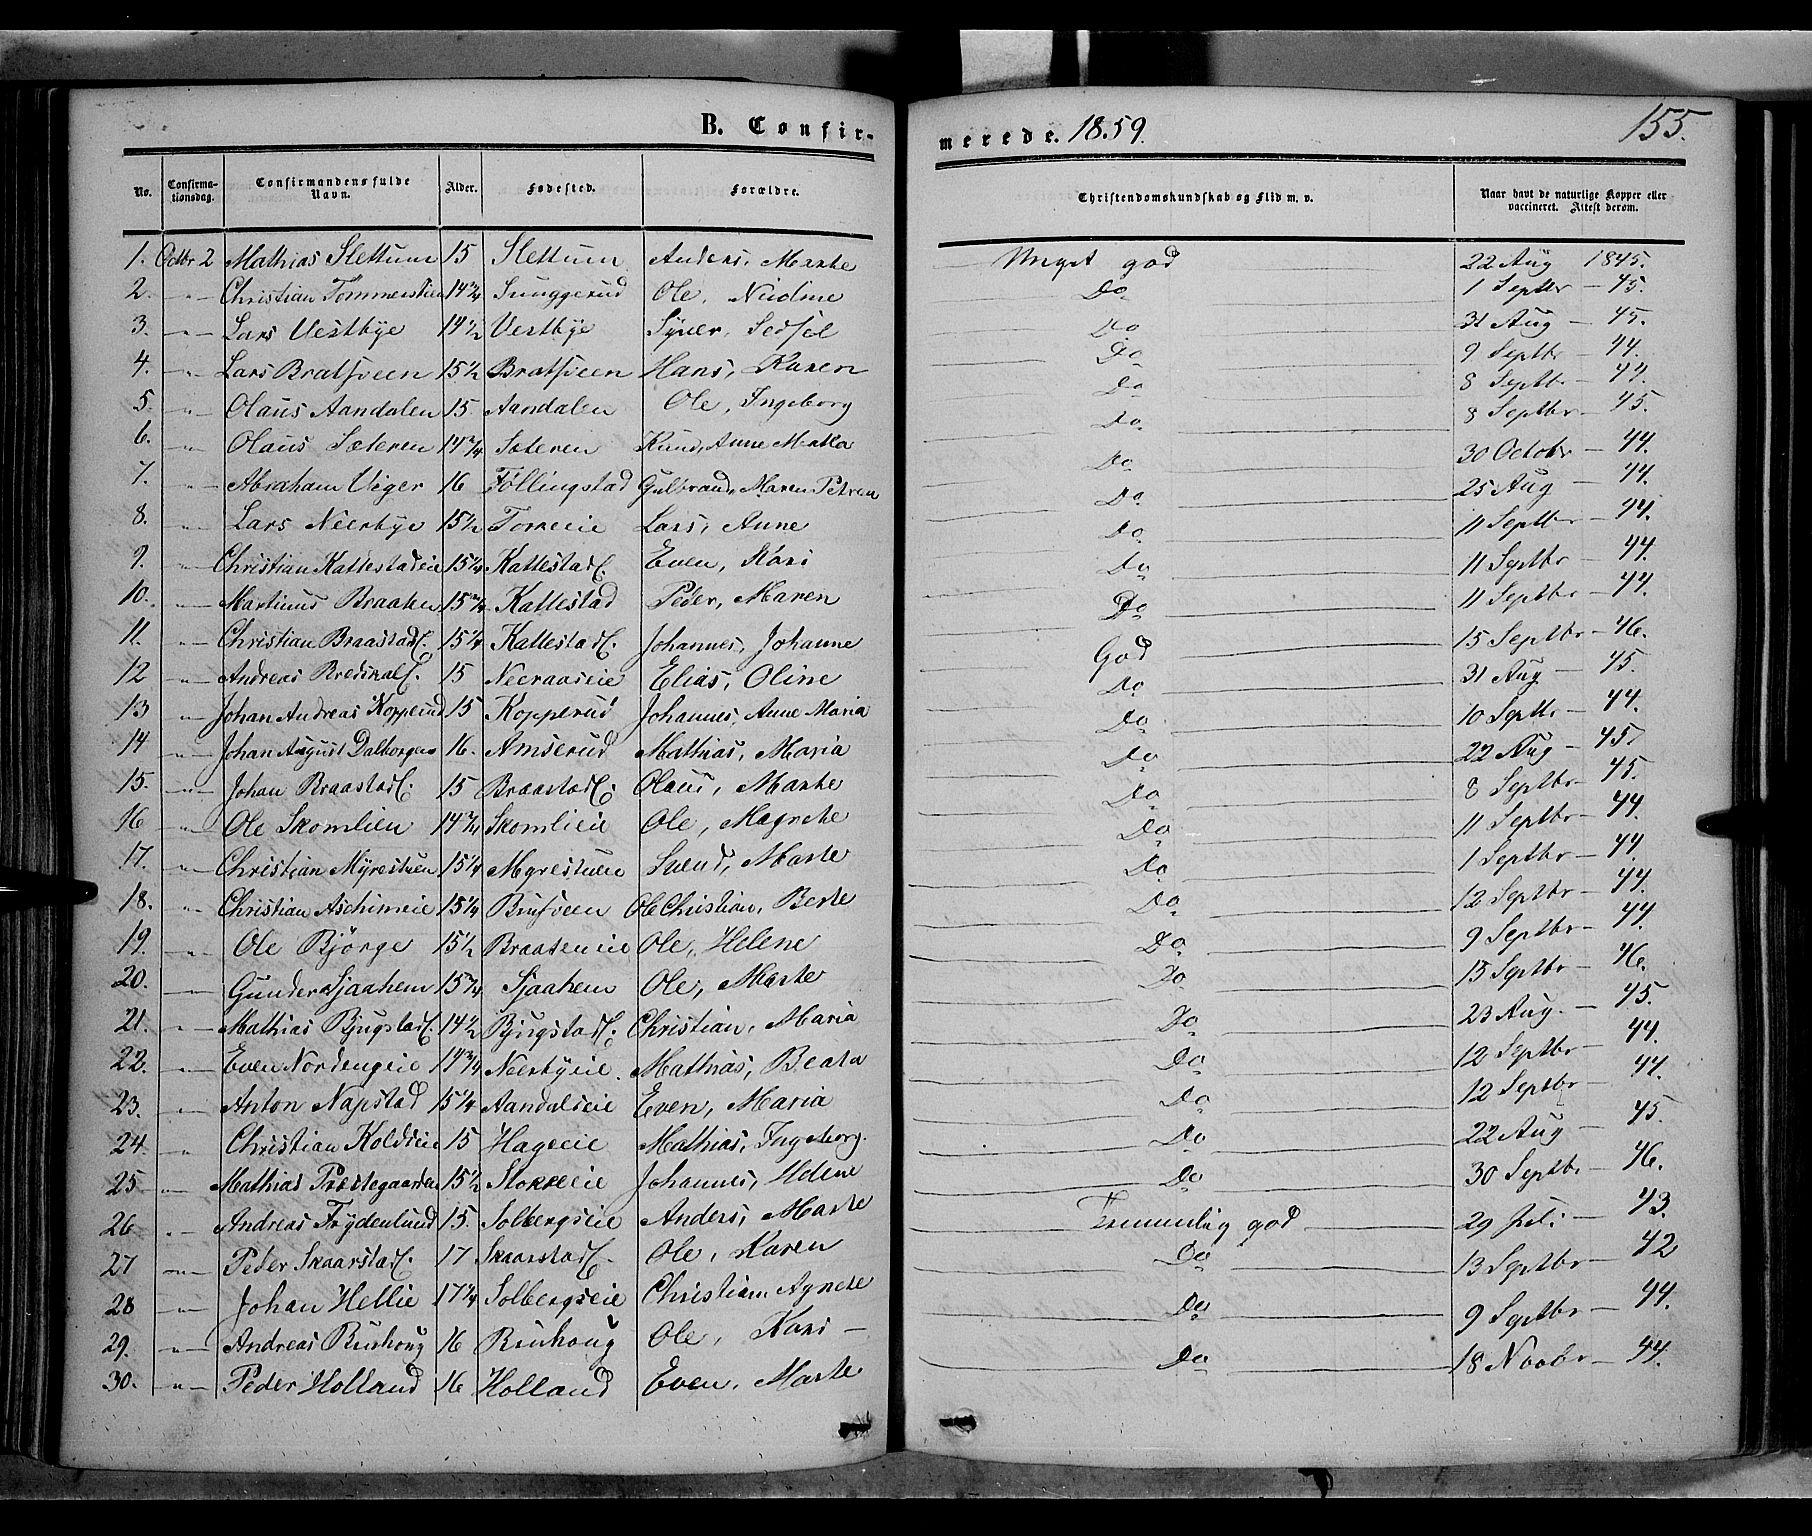 SAH, Vardal prestekontor, H/Ha/Haa/L0006: Ministerialbok nr. 6, 1854-1866, s. 155